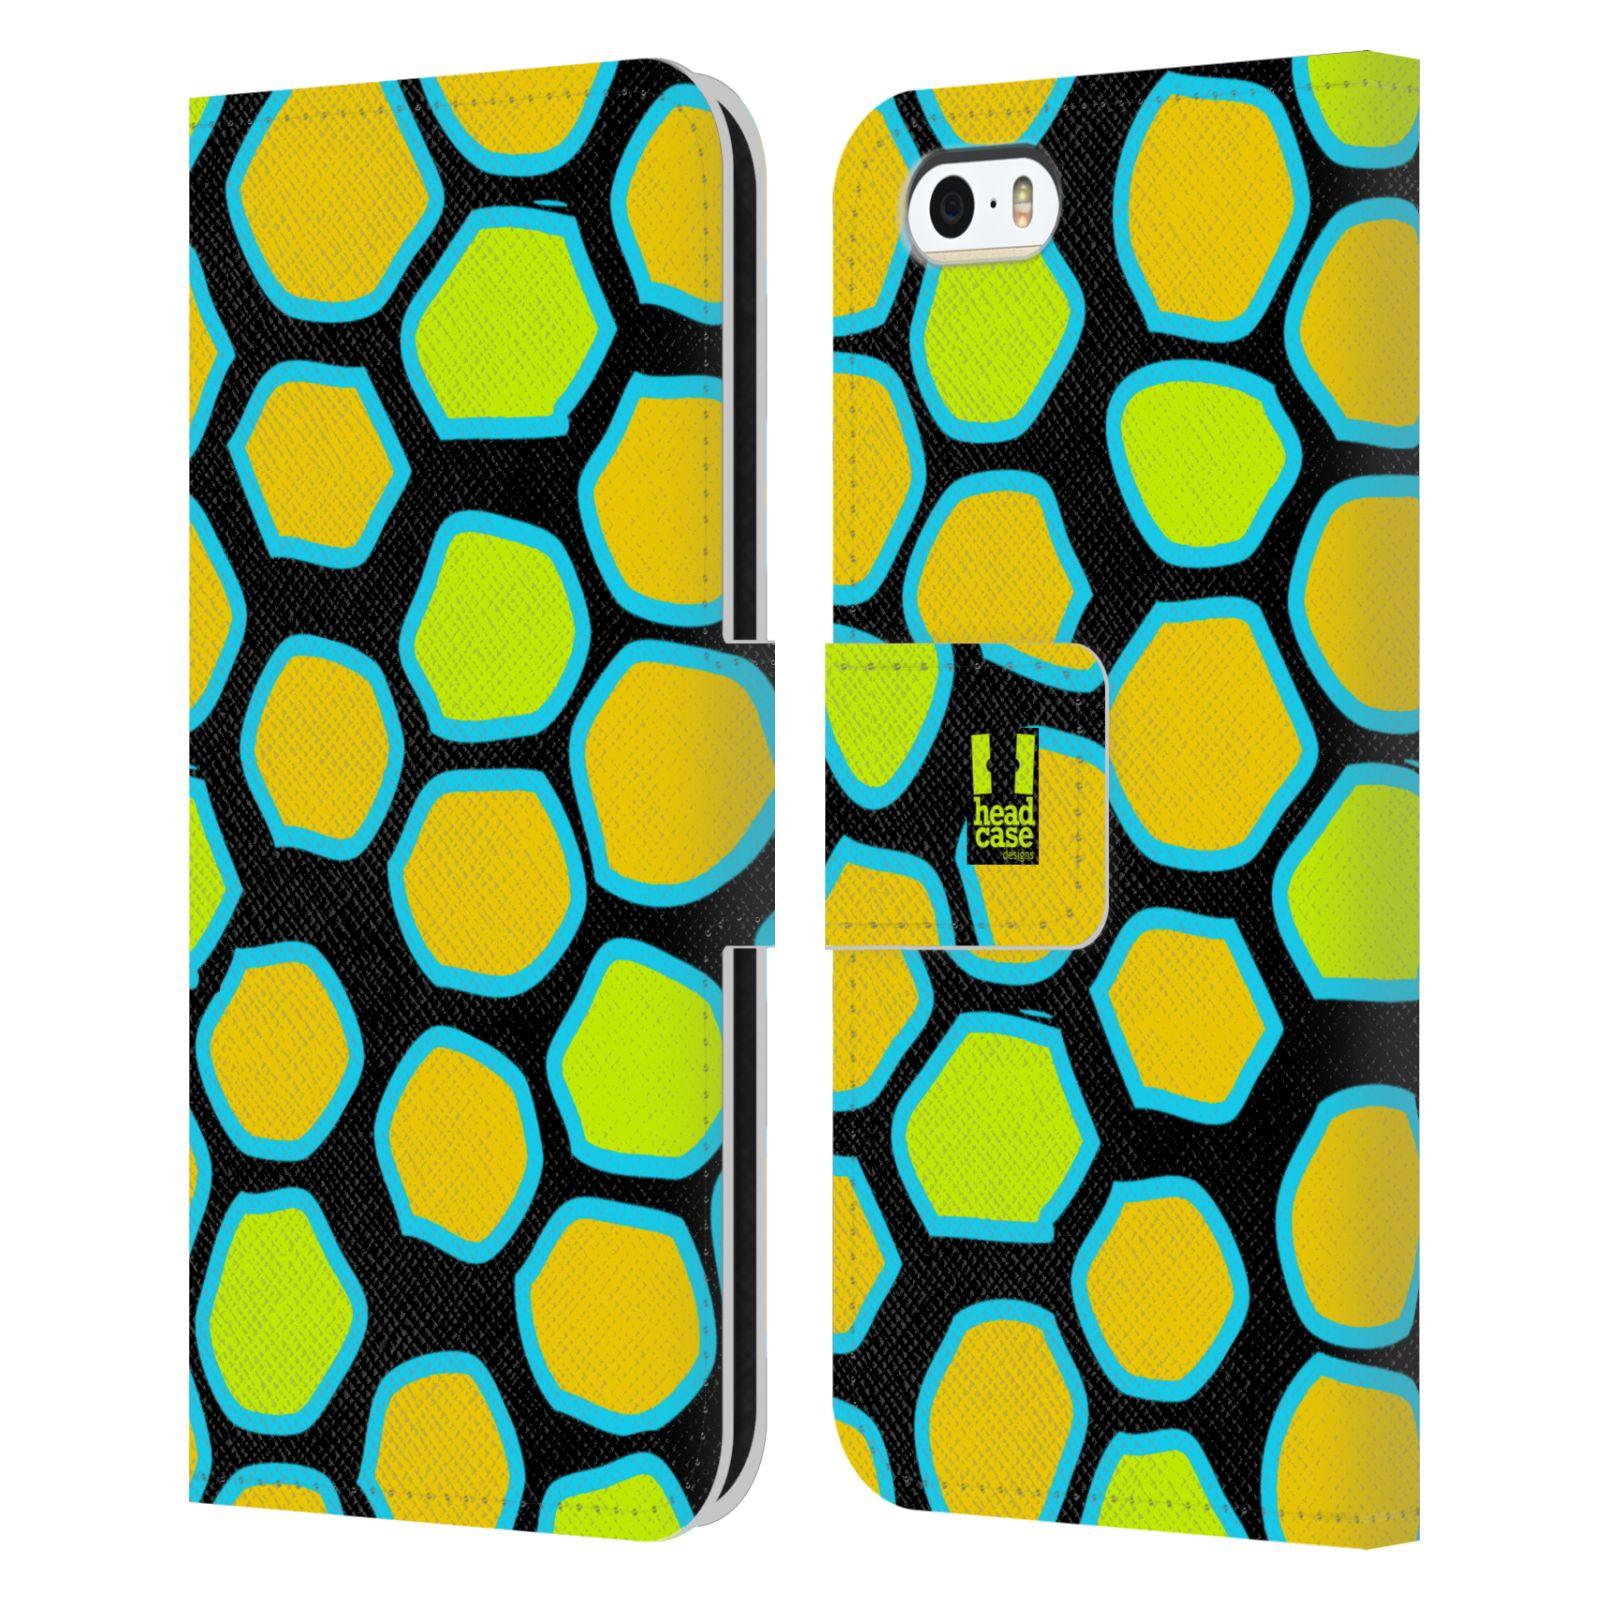 HEAD CASE Flipové pouzdro pro mobil Apple Iphone 5/5s Zvířecí barevné vzory žlutý had